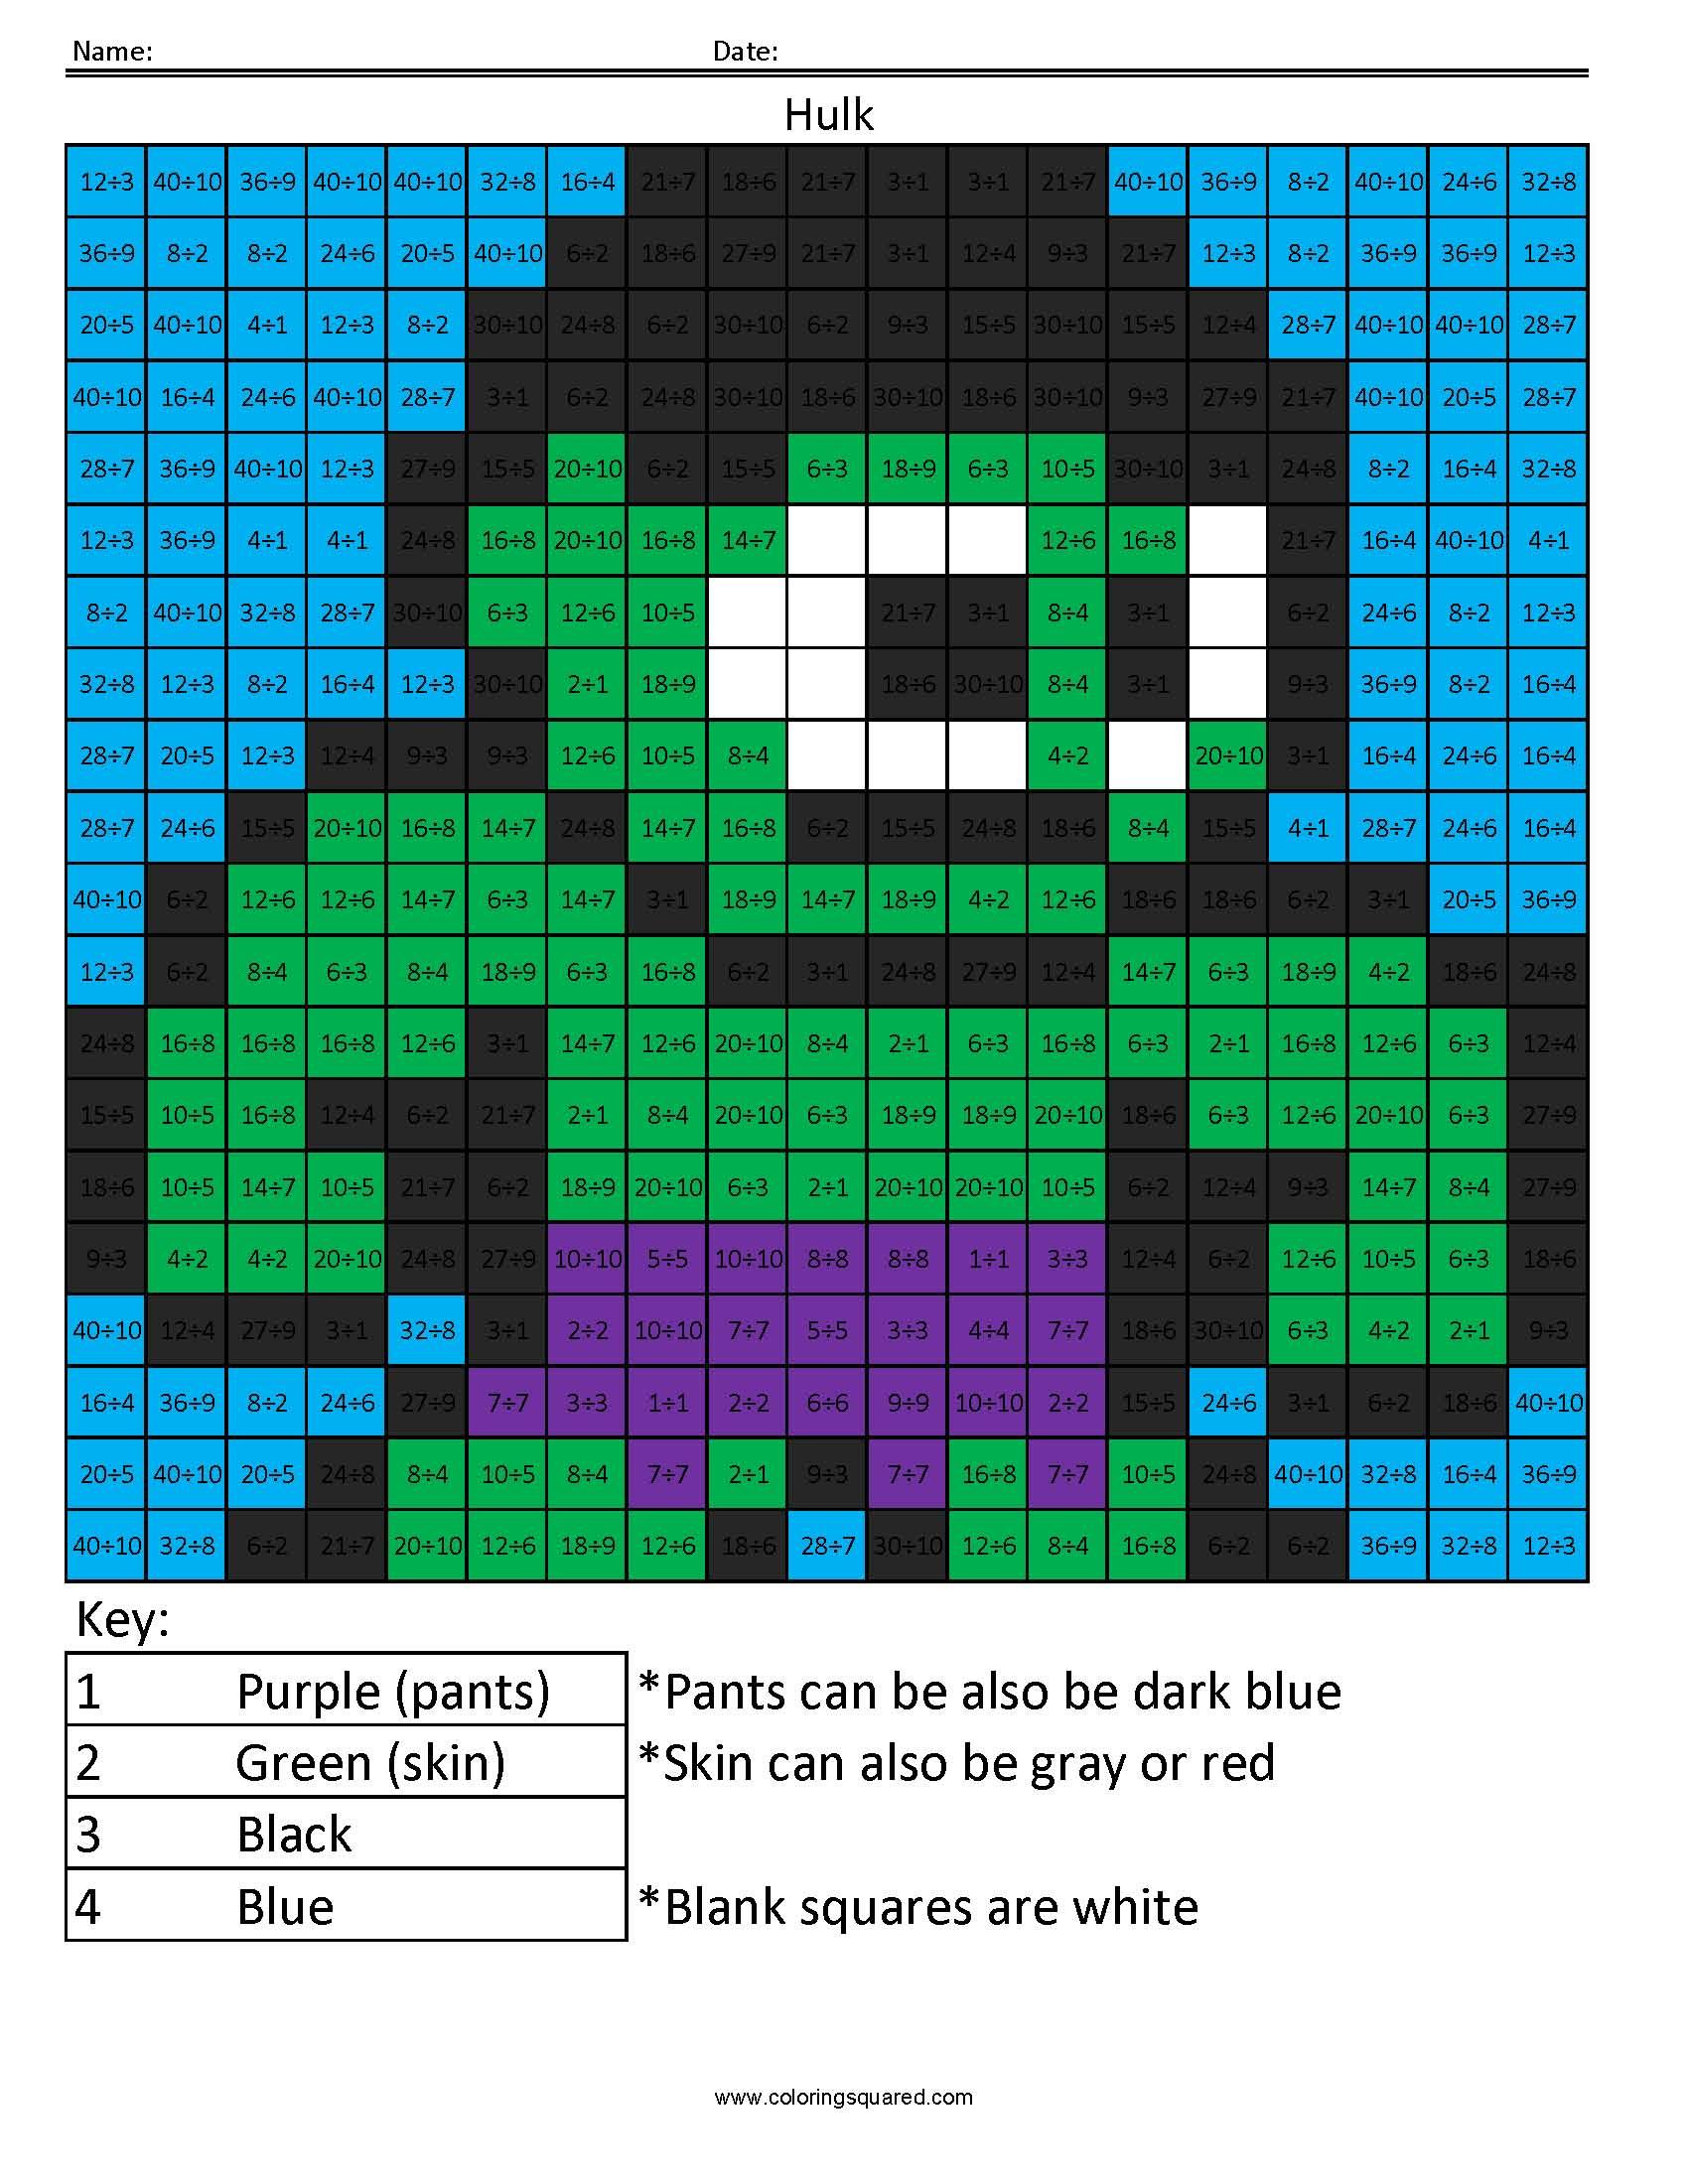 Hulk- Basic Division - Coloring Squared